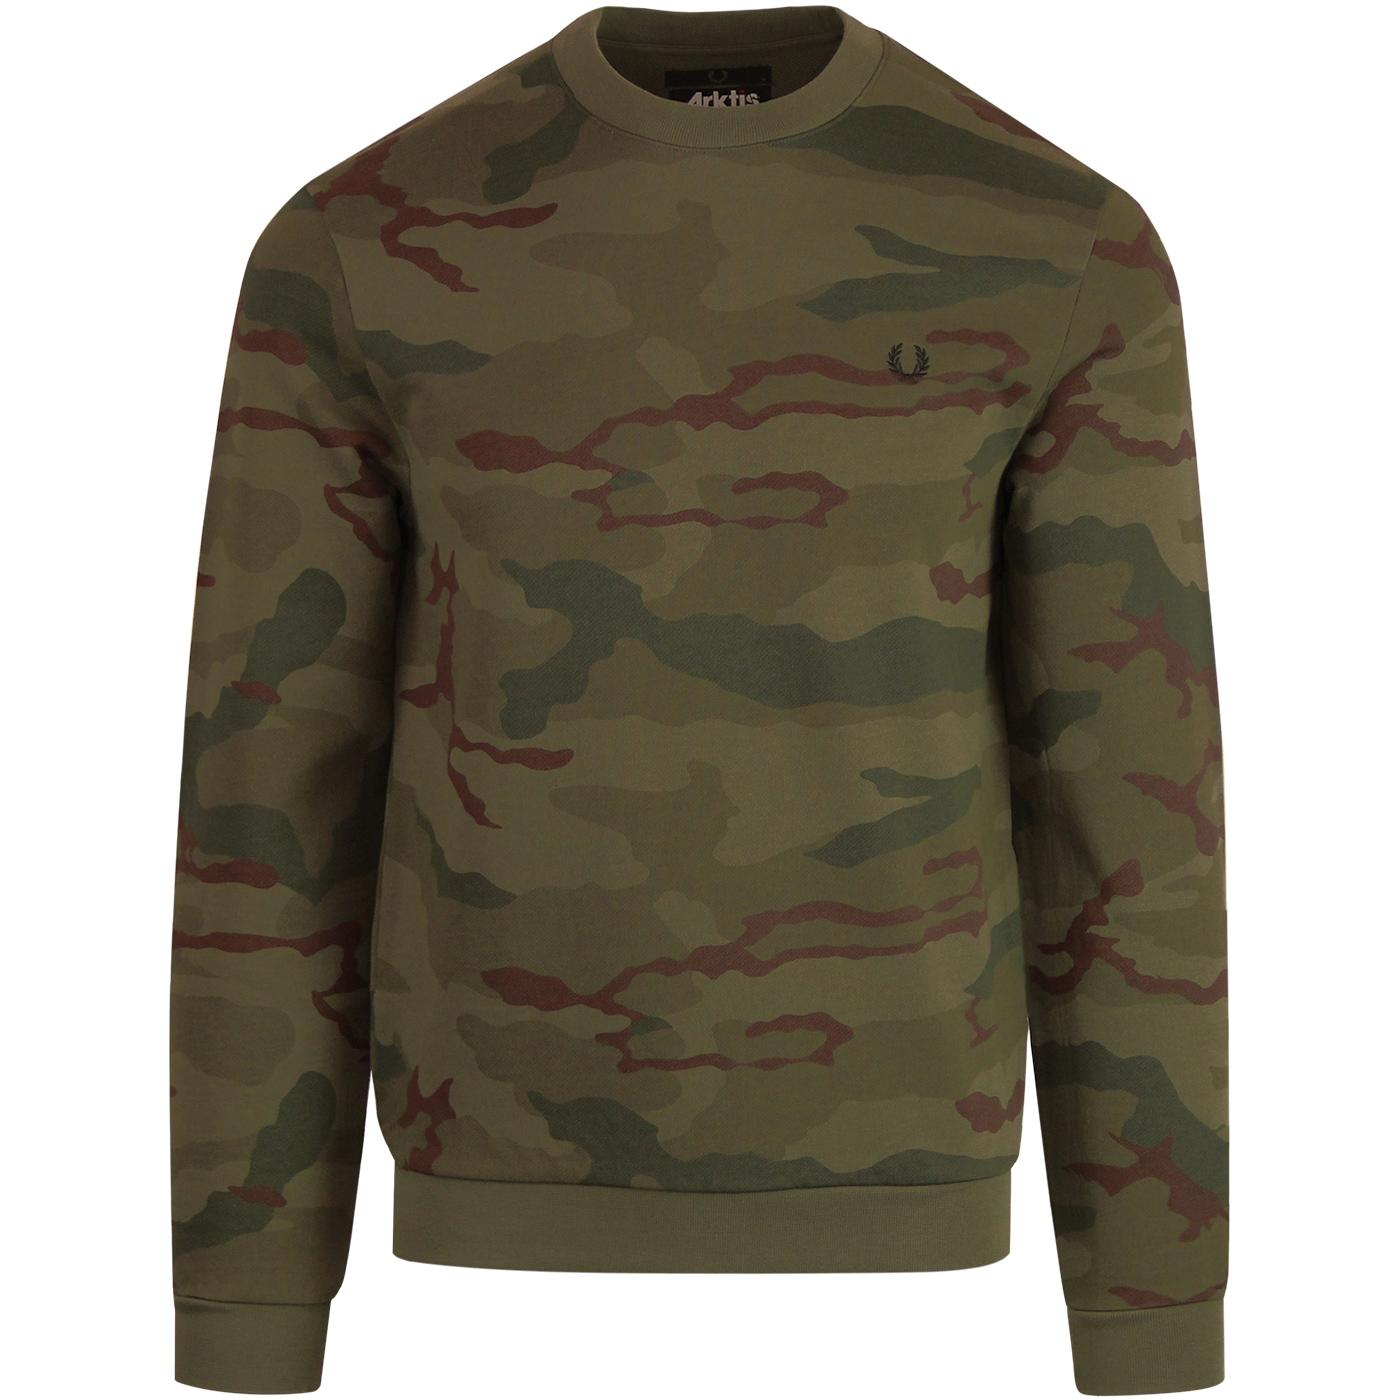 FRED PERRY X ARKTIS Retro Camouflage Sweatshirt